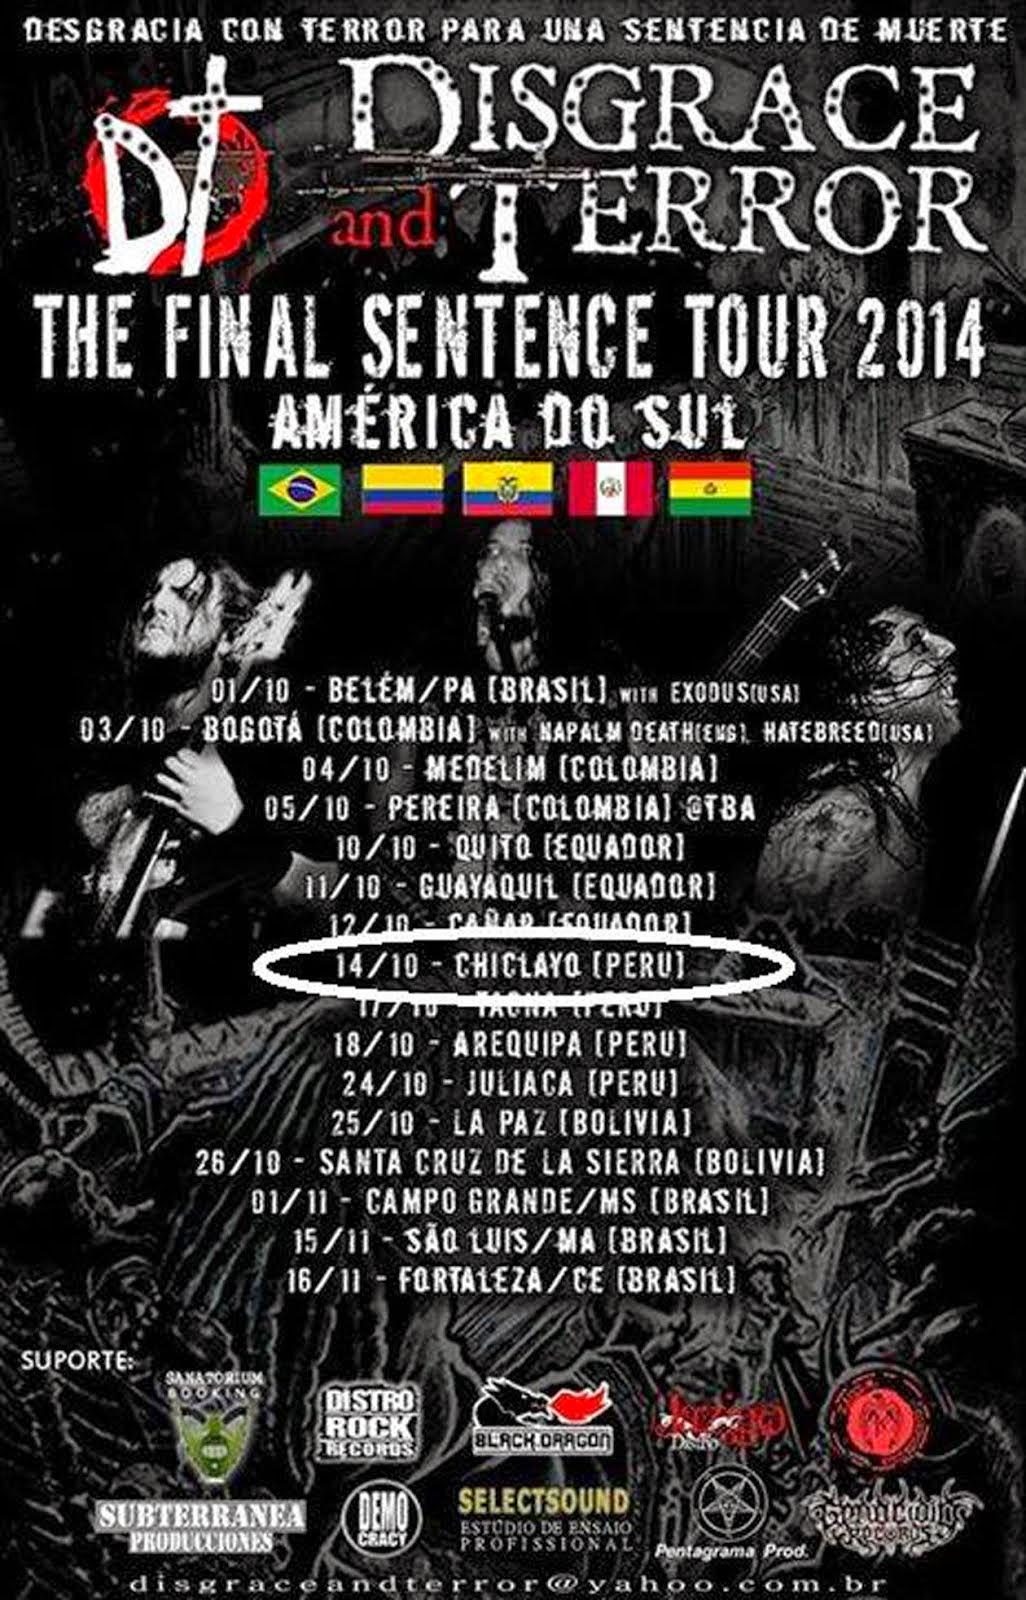 THE FINAL SENTENCE TOUR 2014